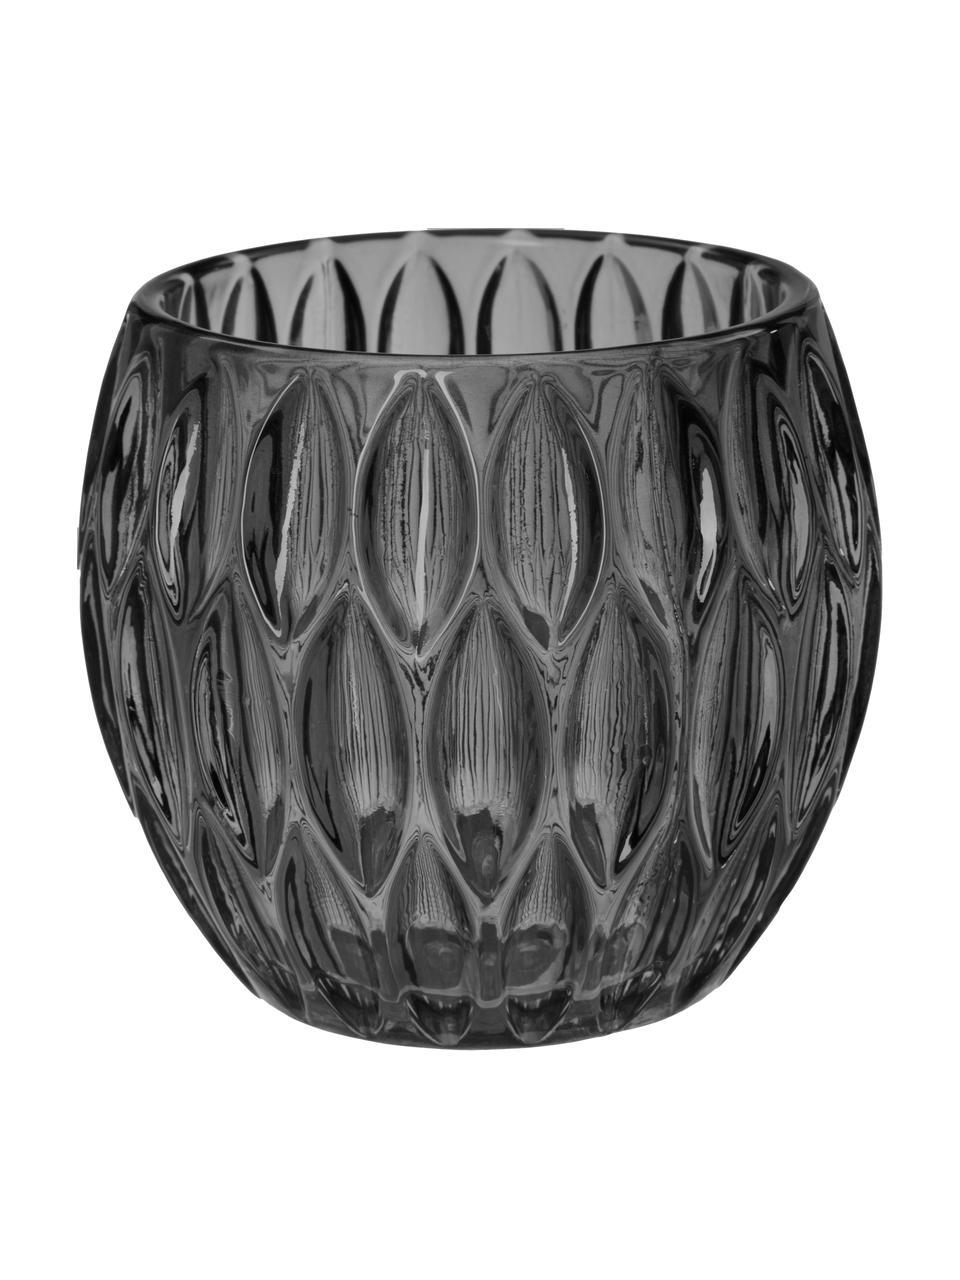 Waxinelichthoudersset Aliza, 3-delig, Glas, Grijs, transparant, Ø 10 x H 9 cm